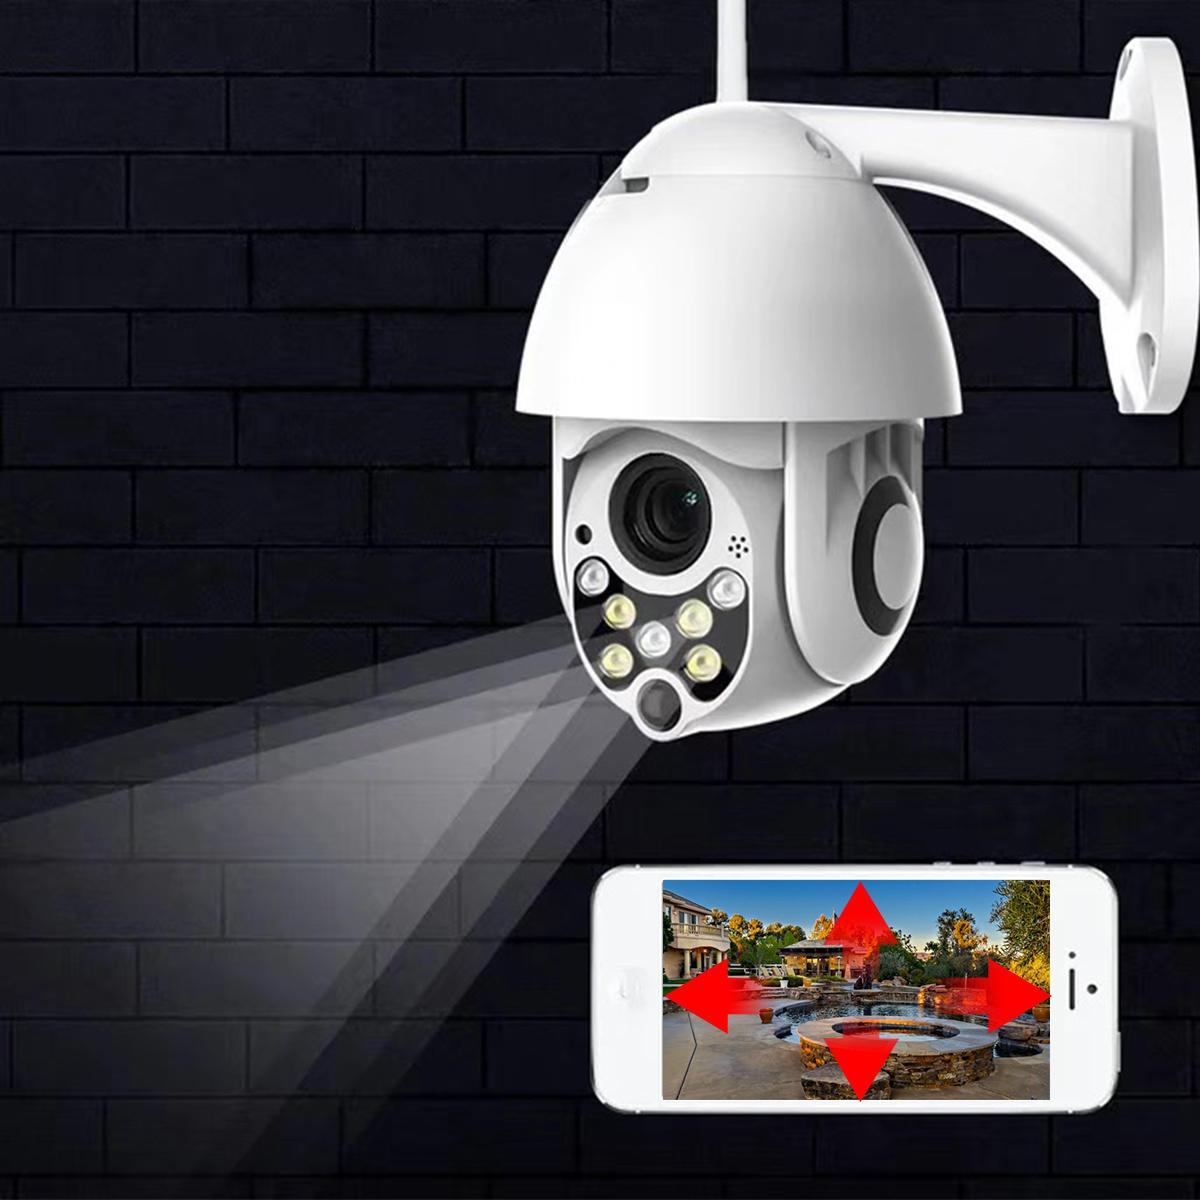 1080P 2MP Wireless Waterproof WIFI IP Security Camera Intercom Night Vision  CCTV ONVIF Protocol AP Hotspot